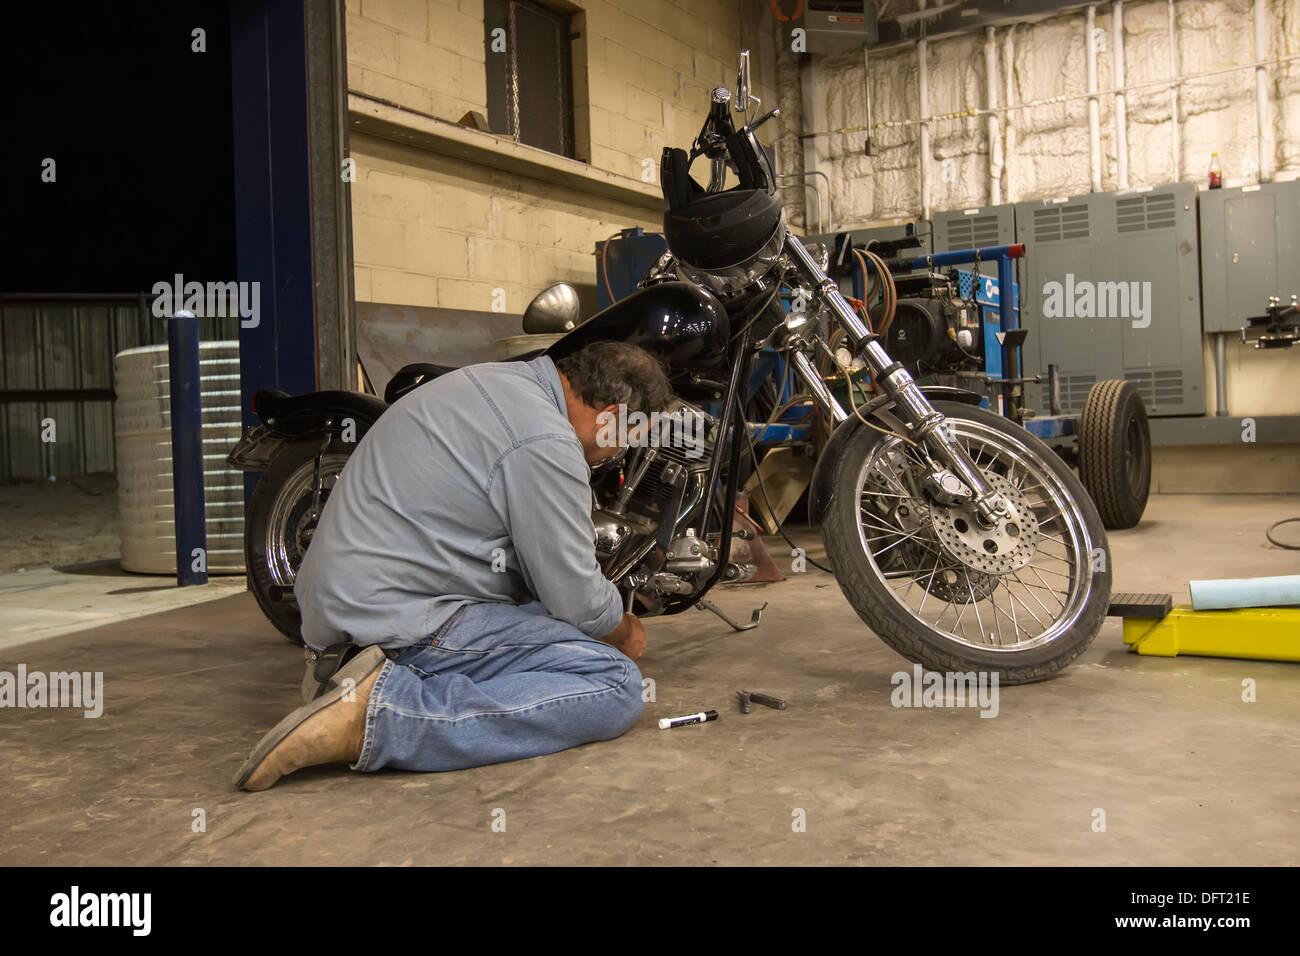 Motorcycle repair stock photos motorcycle repair stock images alamy - American motorbike garage ...